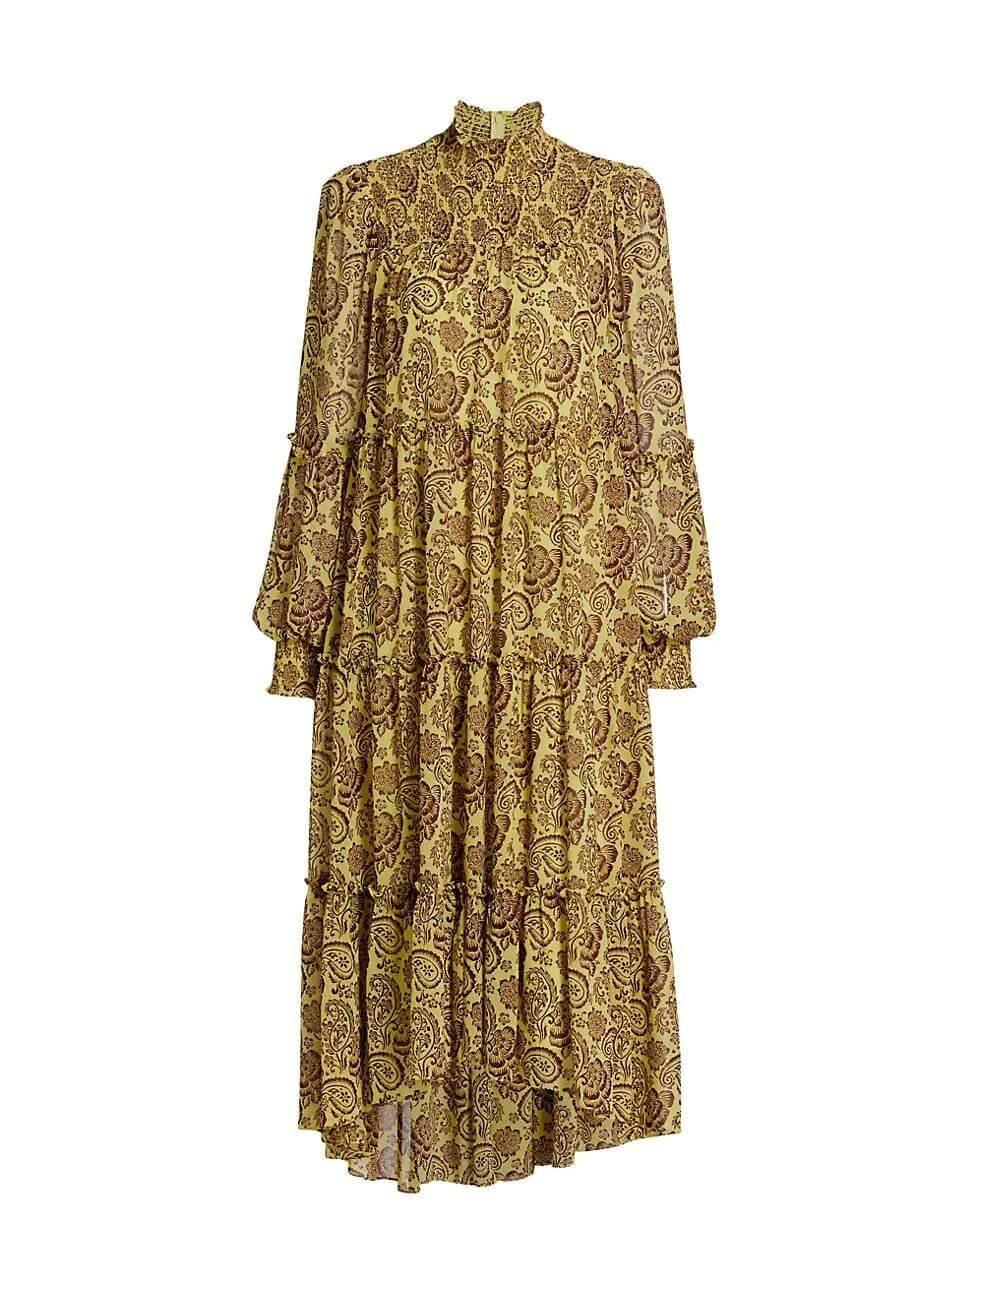 Paisley Rika High Low Dress Item # ZD13394579Z